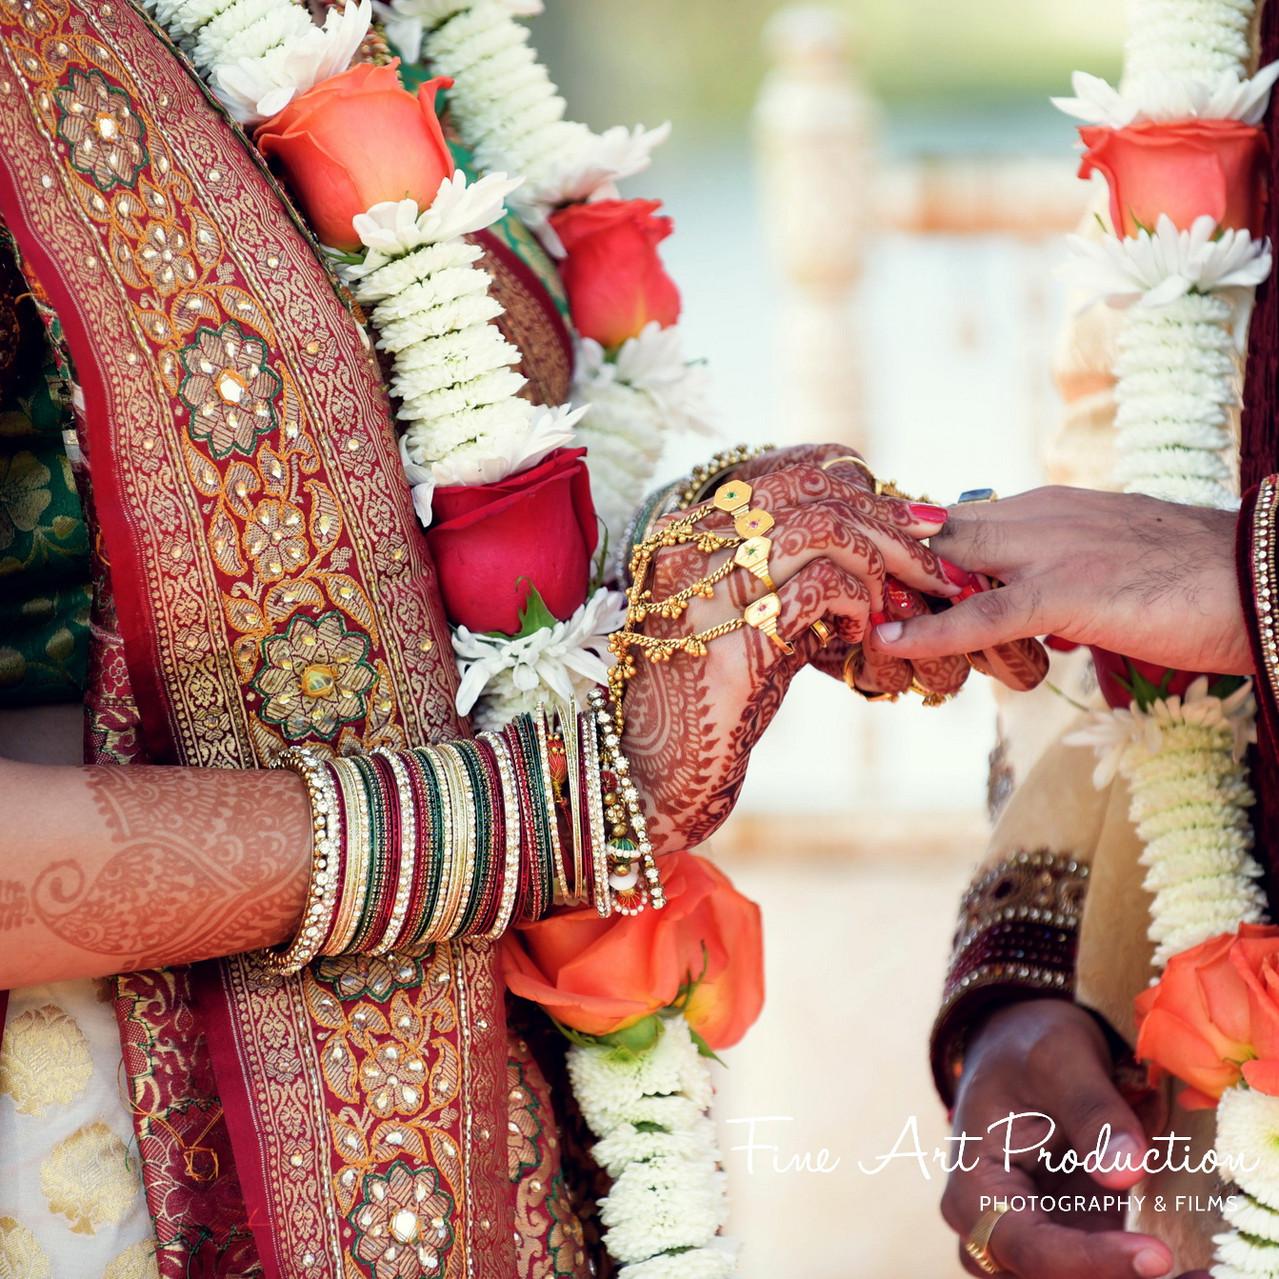 Hyatt-Regency-Grand-Cypress-Indian-Wedding-Photography-Fine-Art-Production-Amish-Thakkar_70